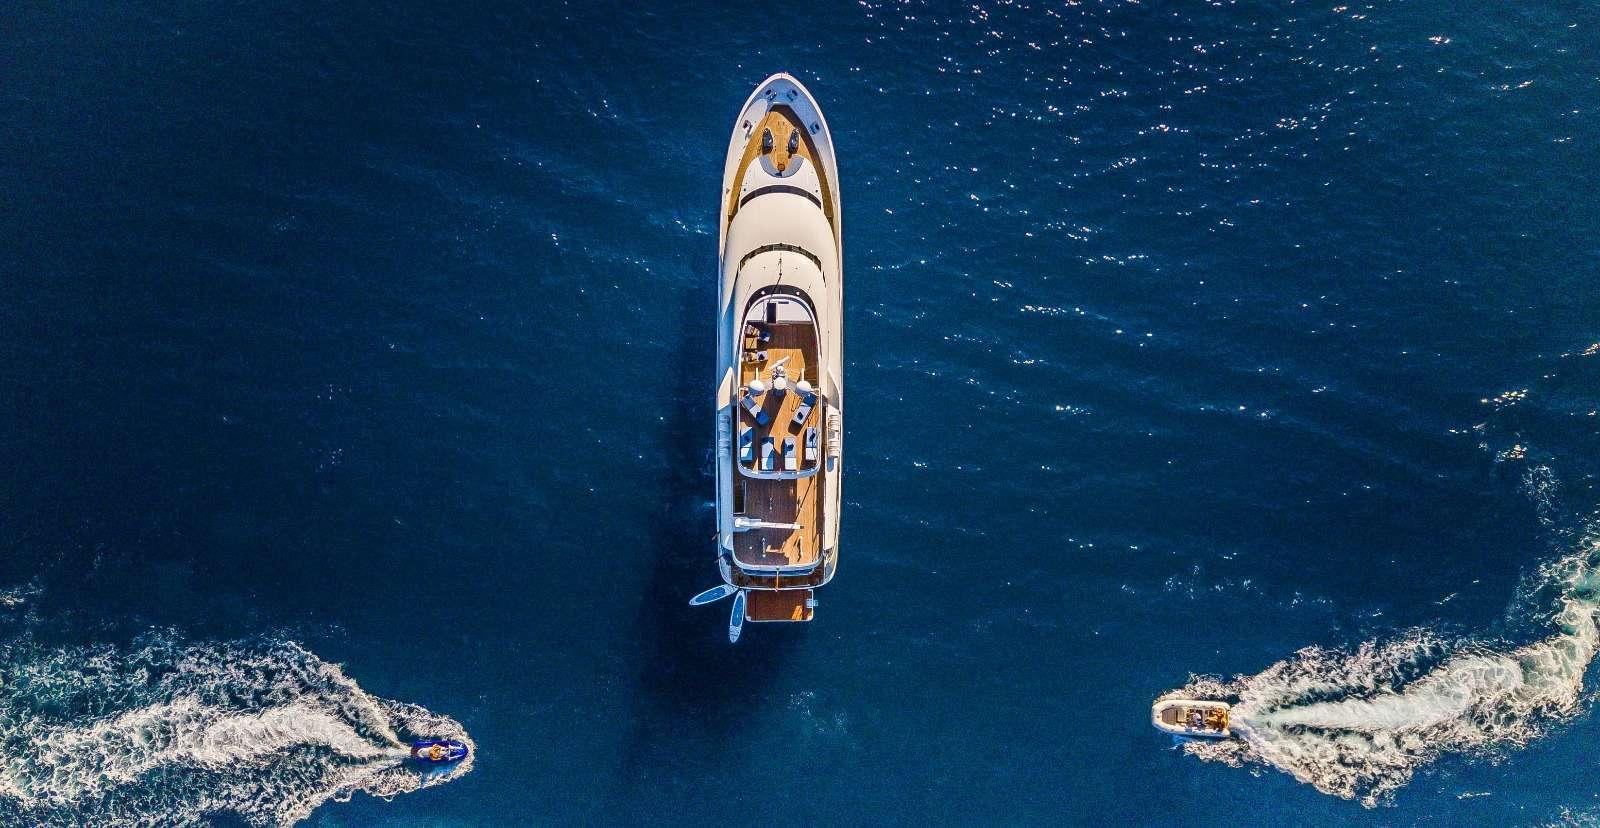 Image of MilaYa yacht #3